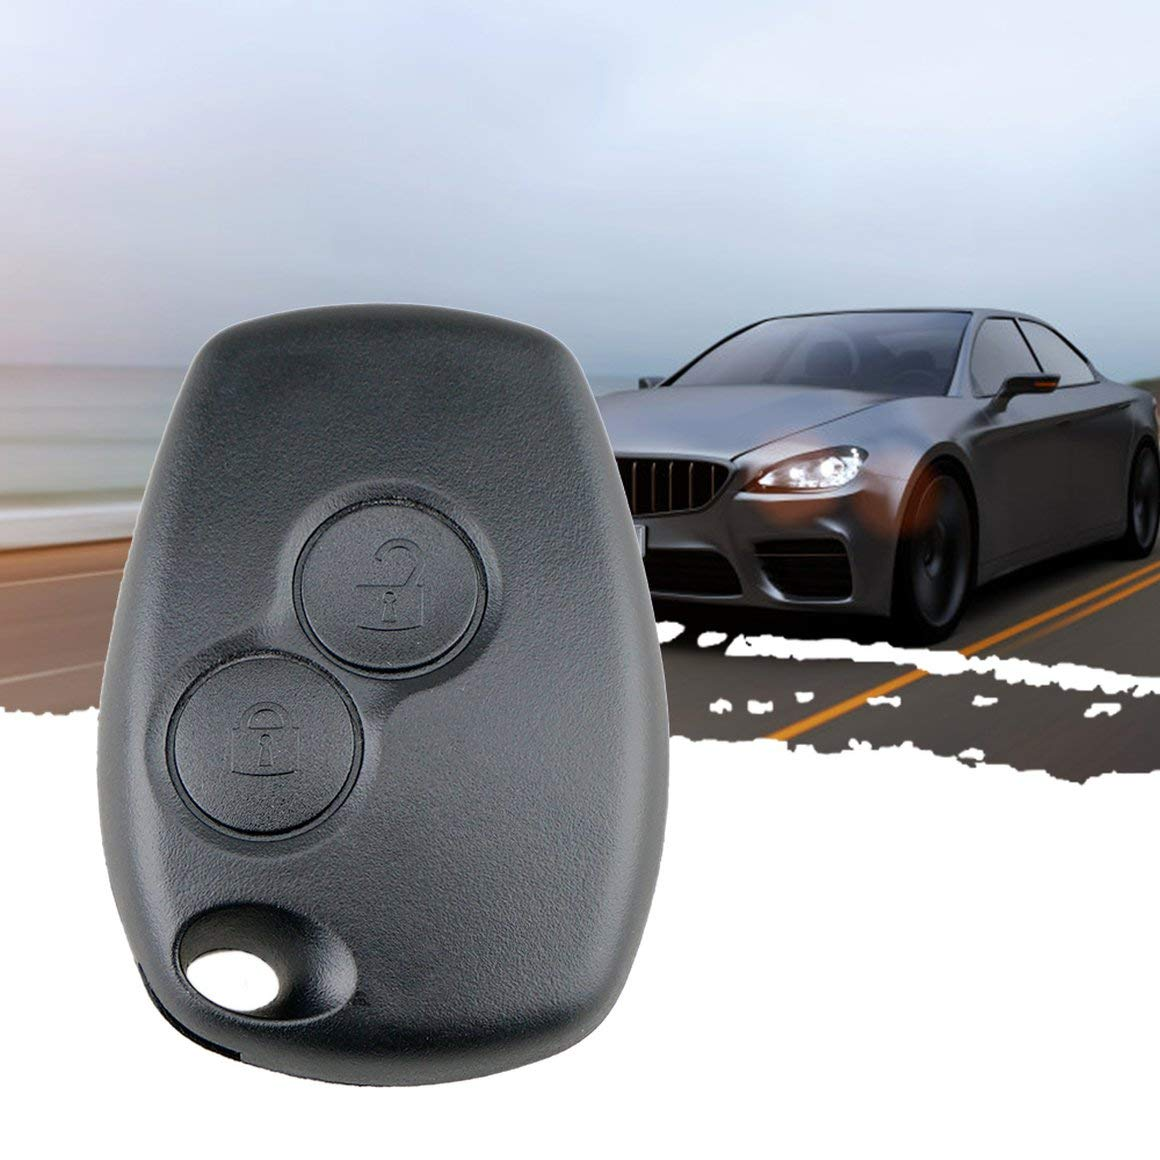 Funnyrunstore 2 Botones Car Key Shell Remote Fob Funda Fob en Blanco para Renault Dacia Modus Clio 3 Twingo Kangoo 2 Sin Logotipo